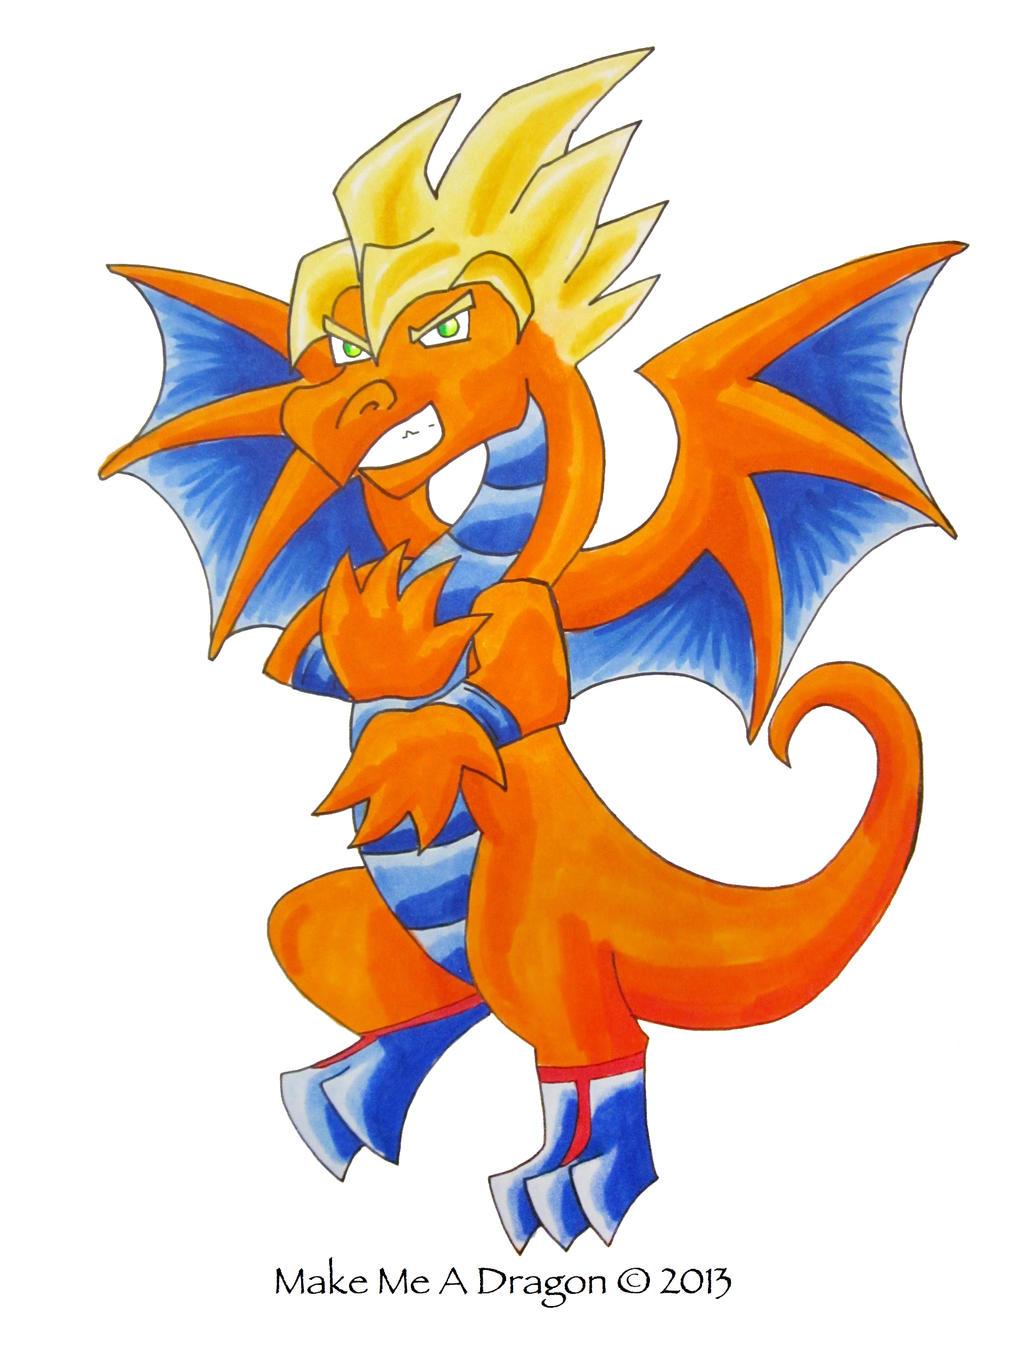 Undress dragon bal z movie erotic movie